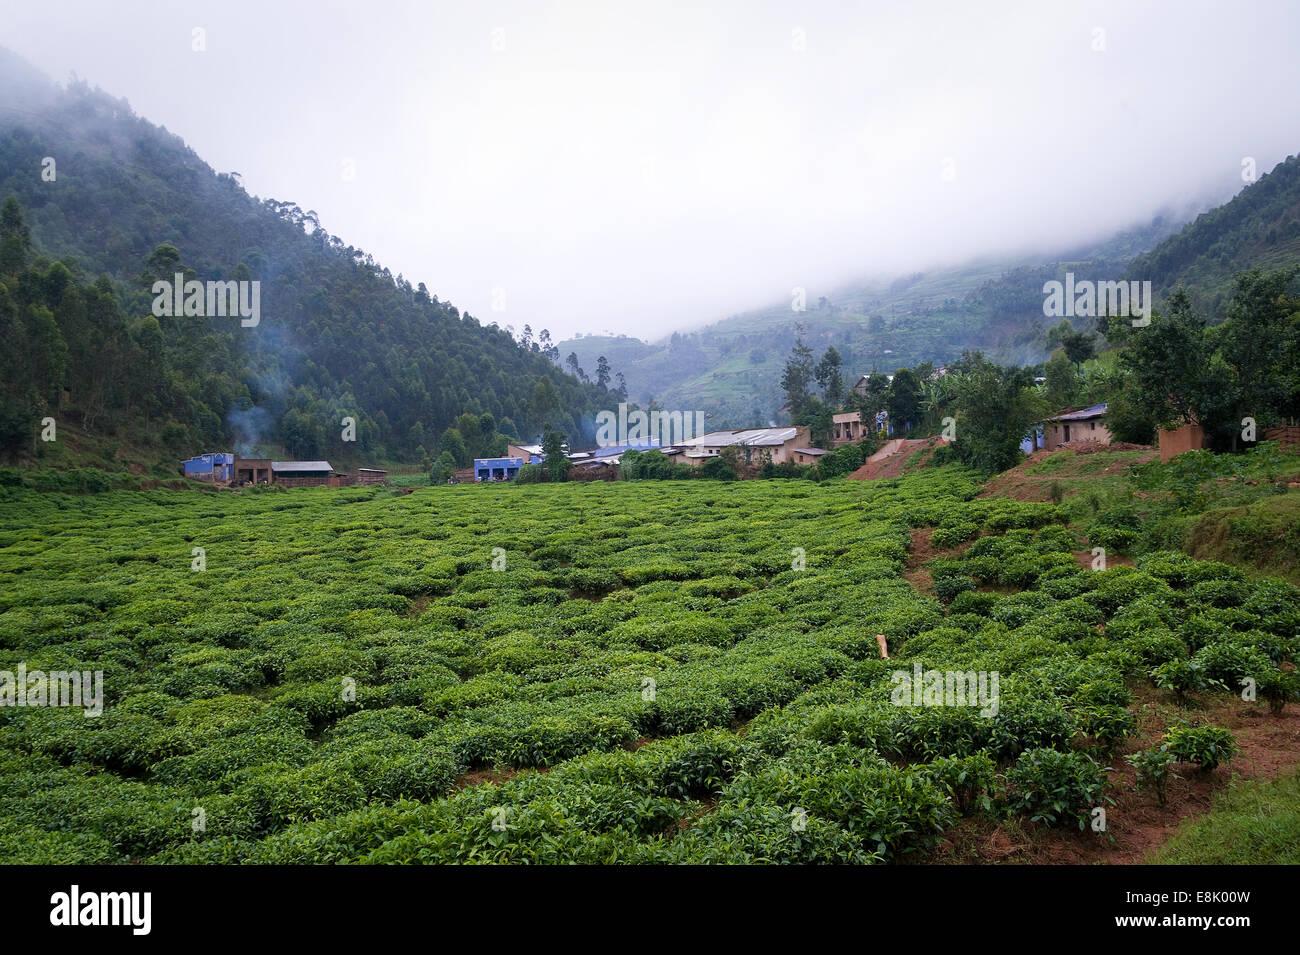 RWANDA, BJUMBA: Around Bjumba are large tea plantations where many people work. Most of the tea production is exported. - Stock Image